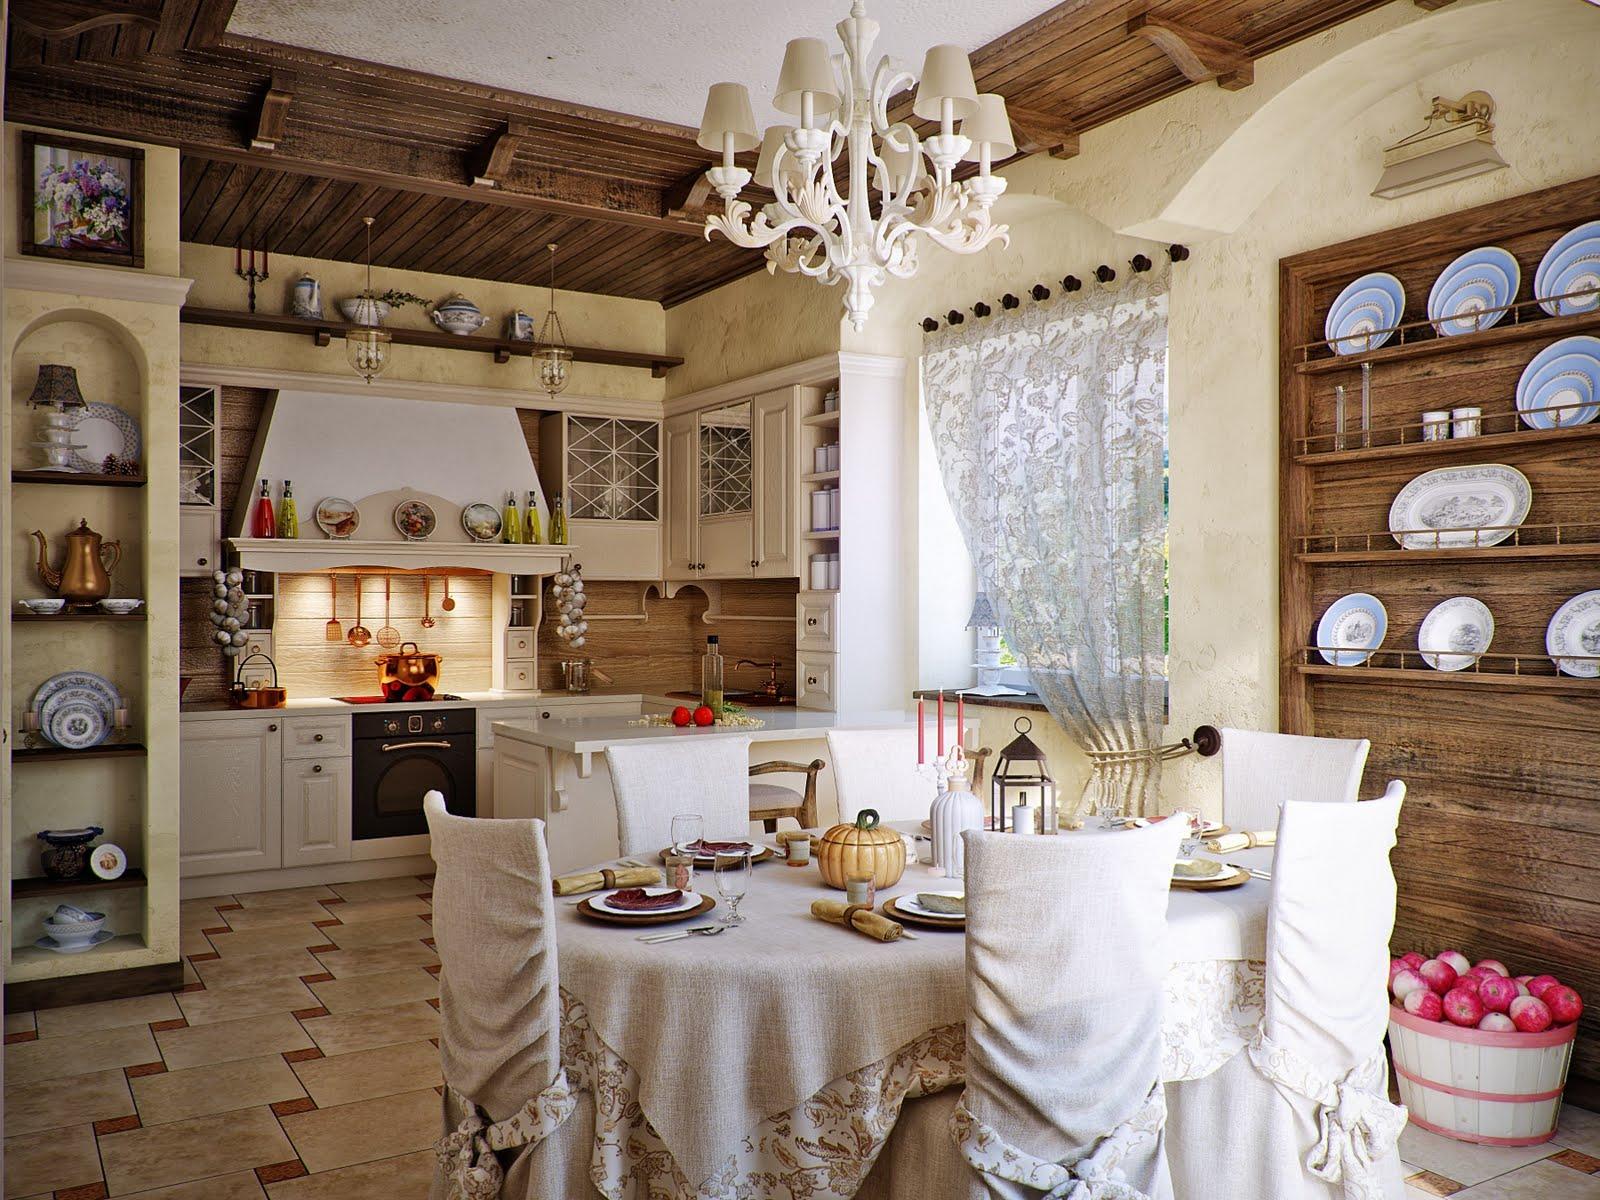 attractive country kitchen designs ideas that inspire you country kitchen design ideas awesome country kitchen design by Svetlana Nezus Interior Designs